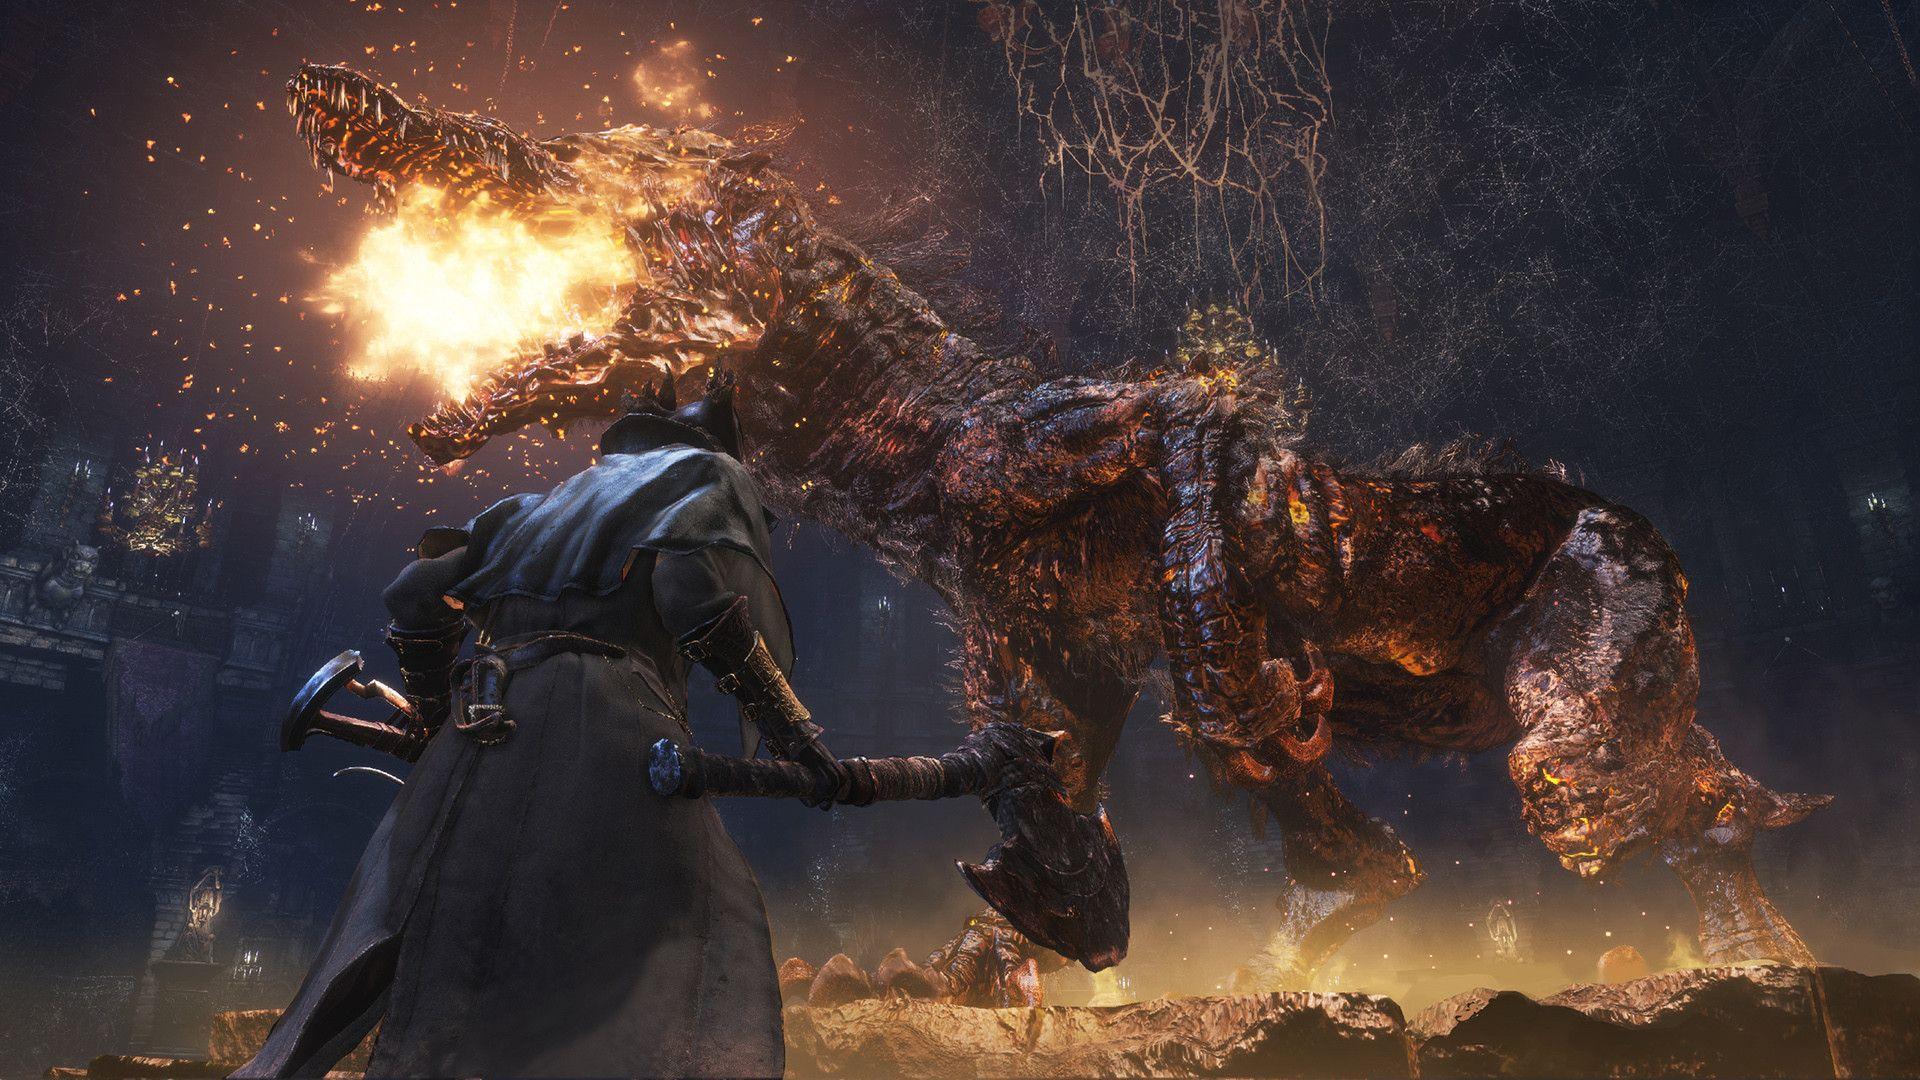 Bloodborne GameSpot Bloodborne, Ps4 exclusives, Ps4 games